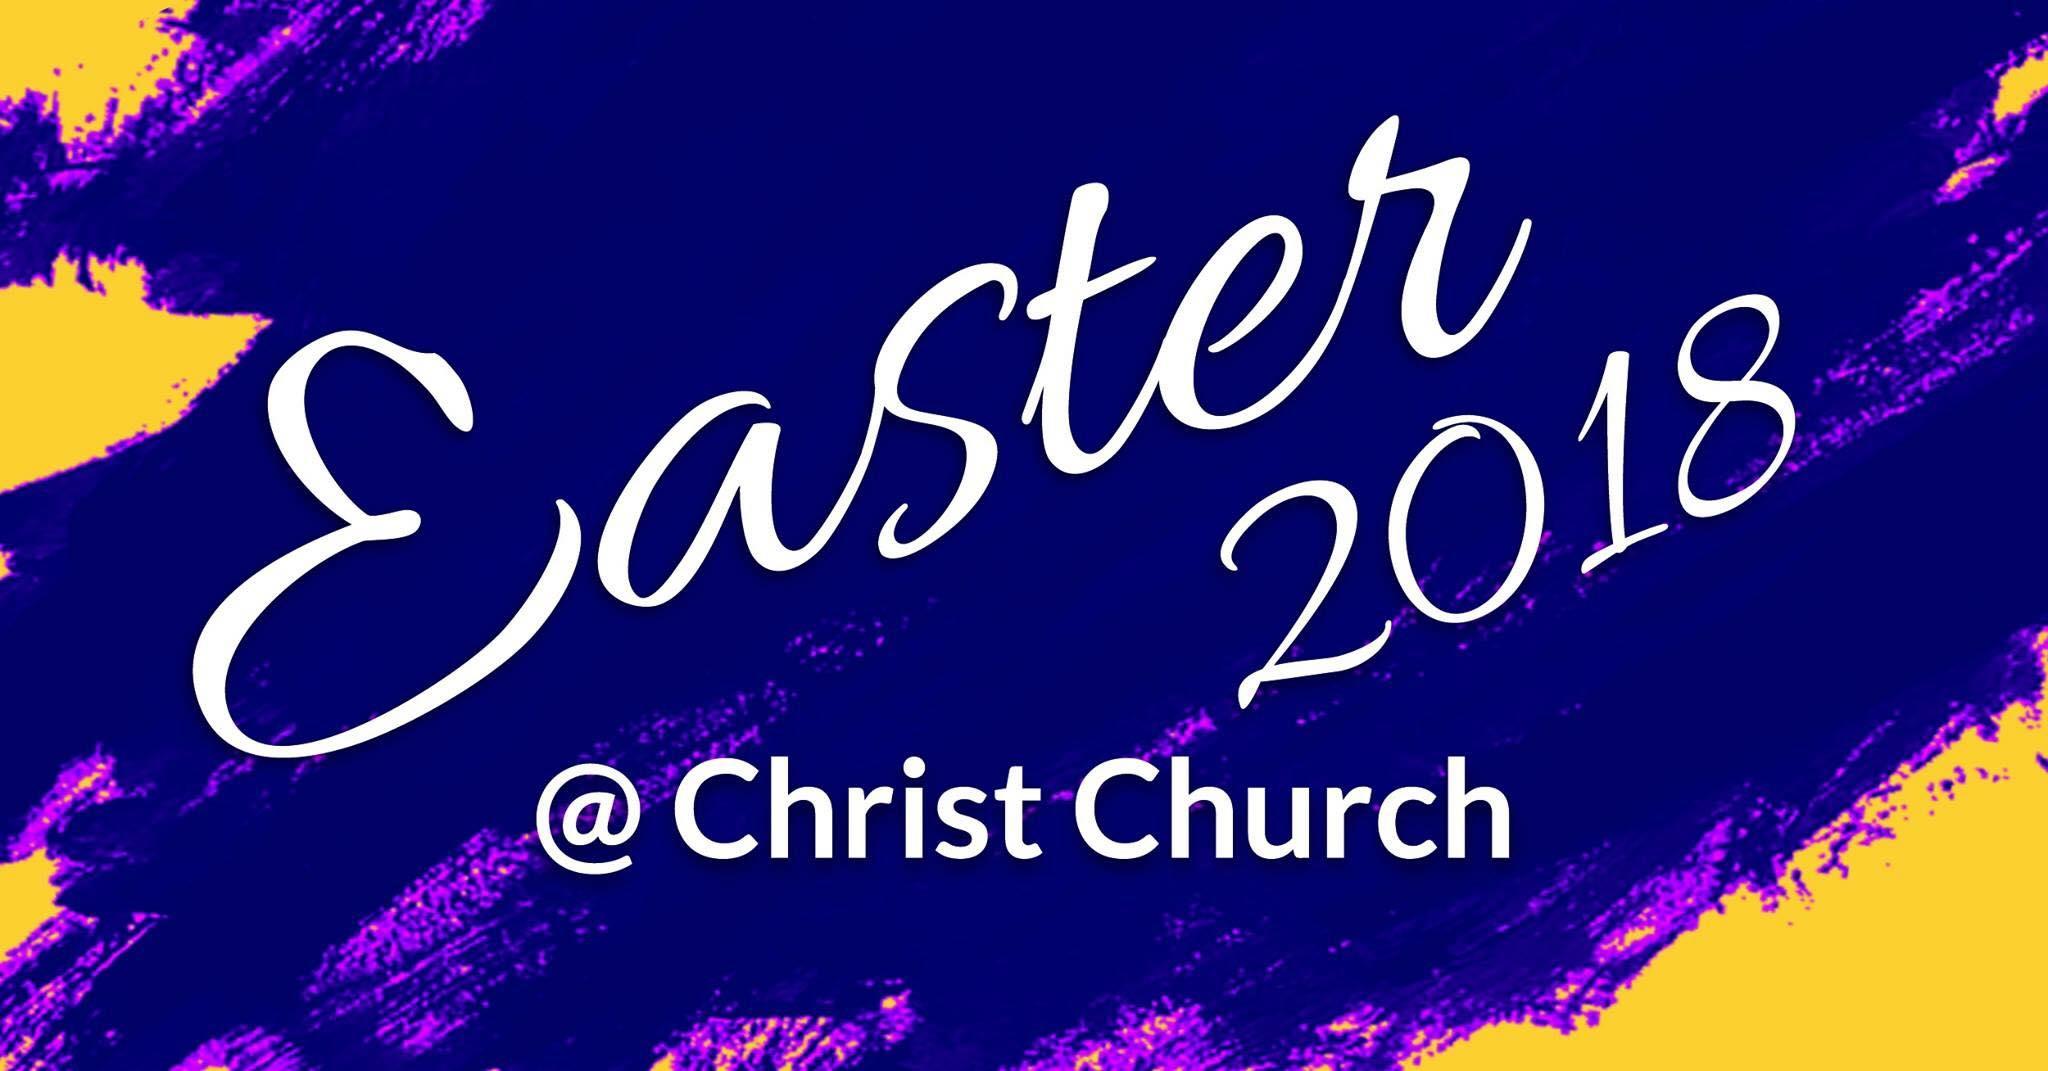 Invite Someone To Christ Church!